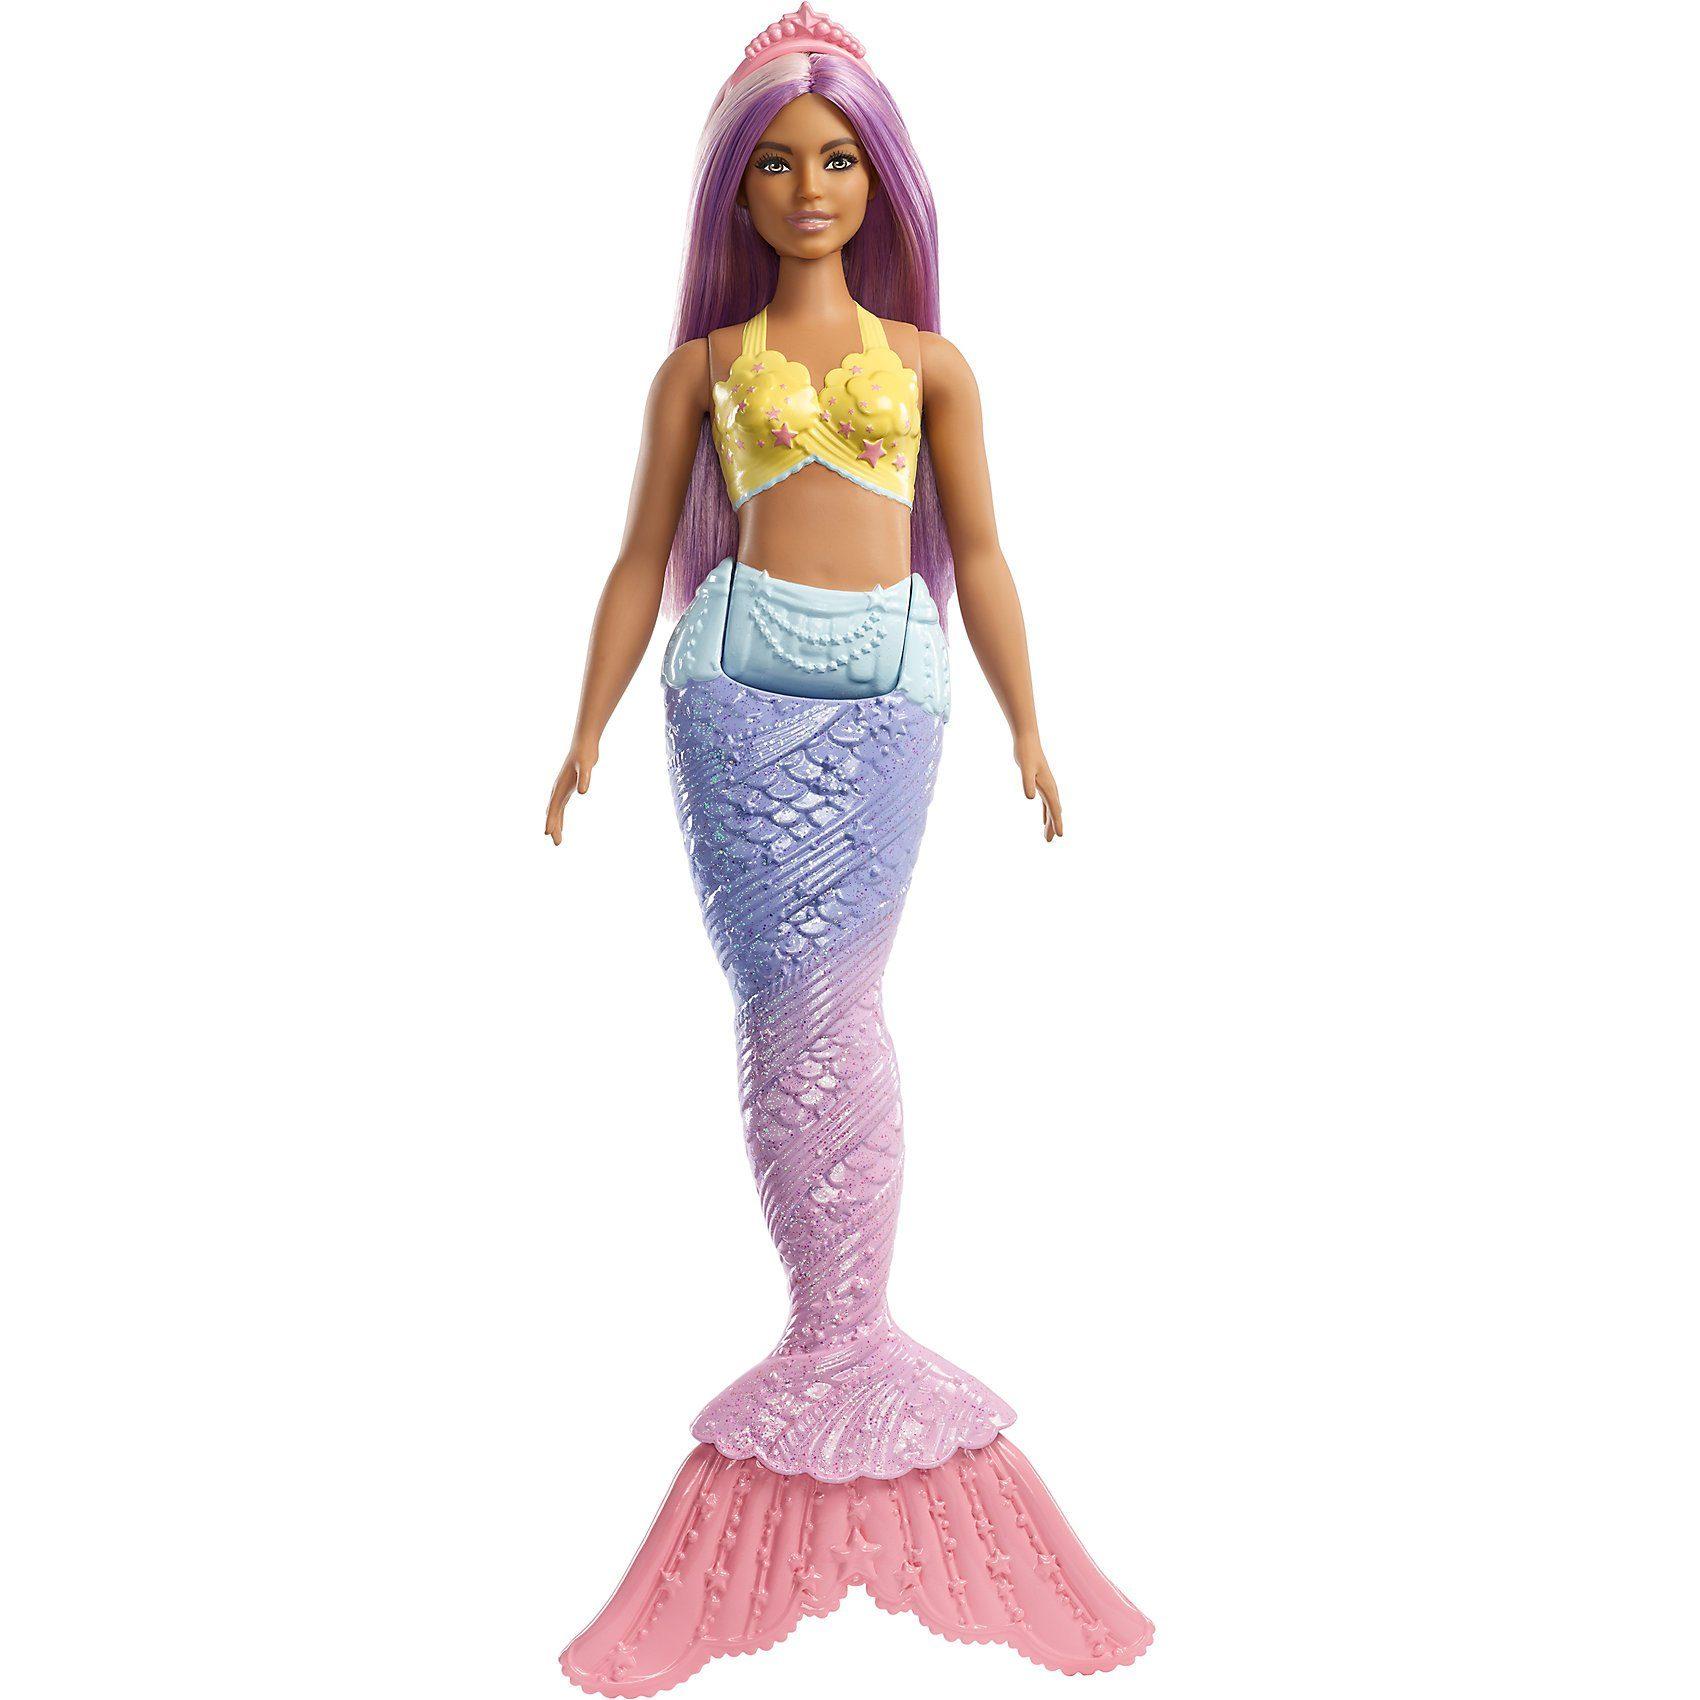 Mattel® Barbie Dreamtopia Meerjungfrau Puppe 1